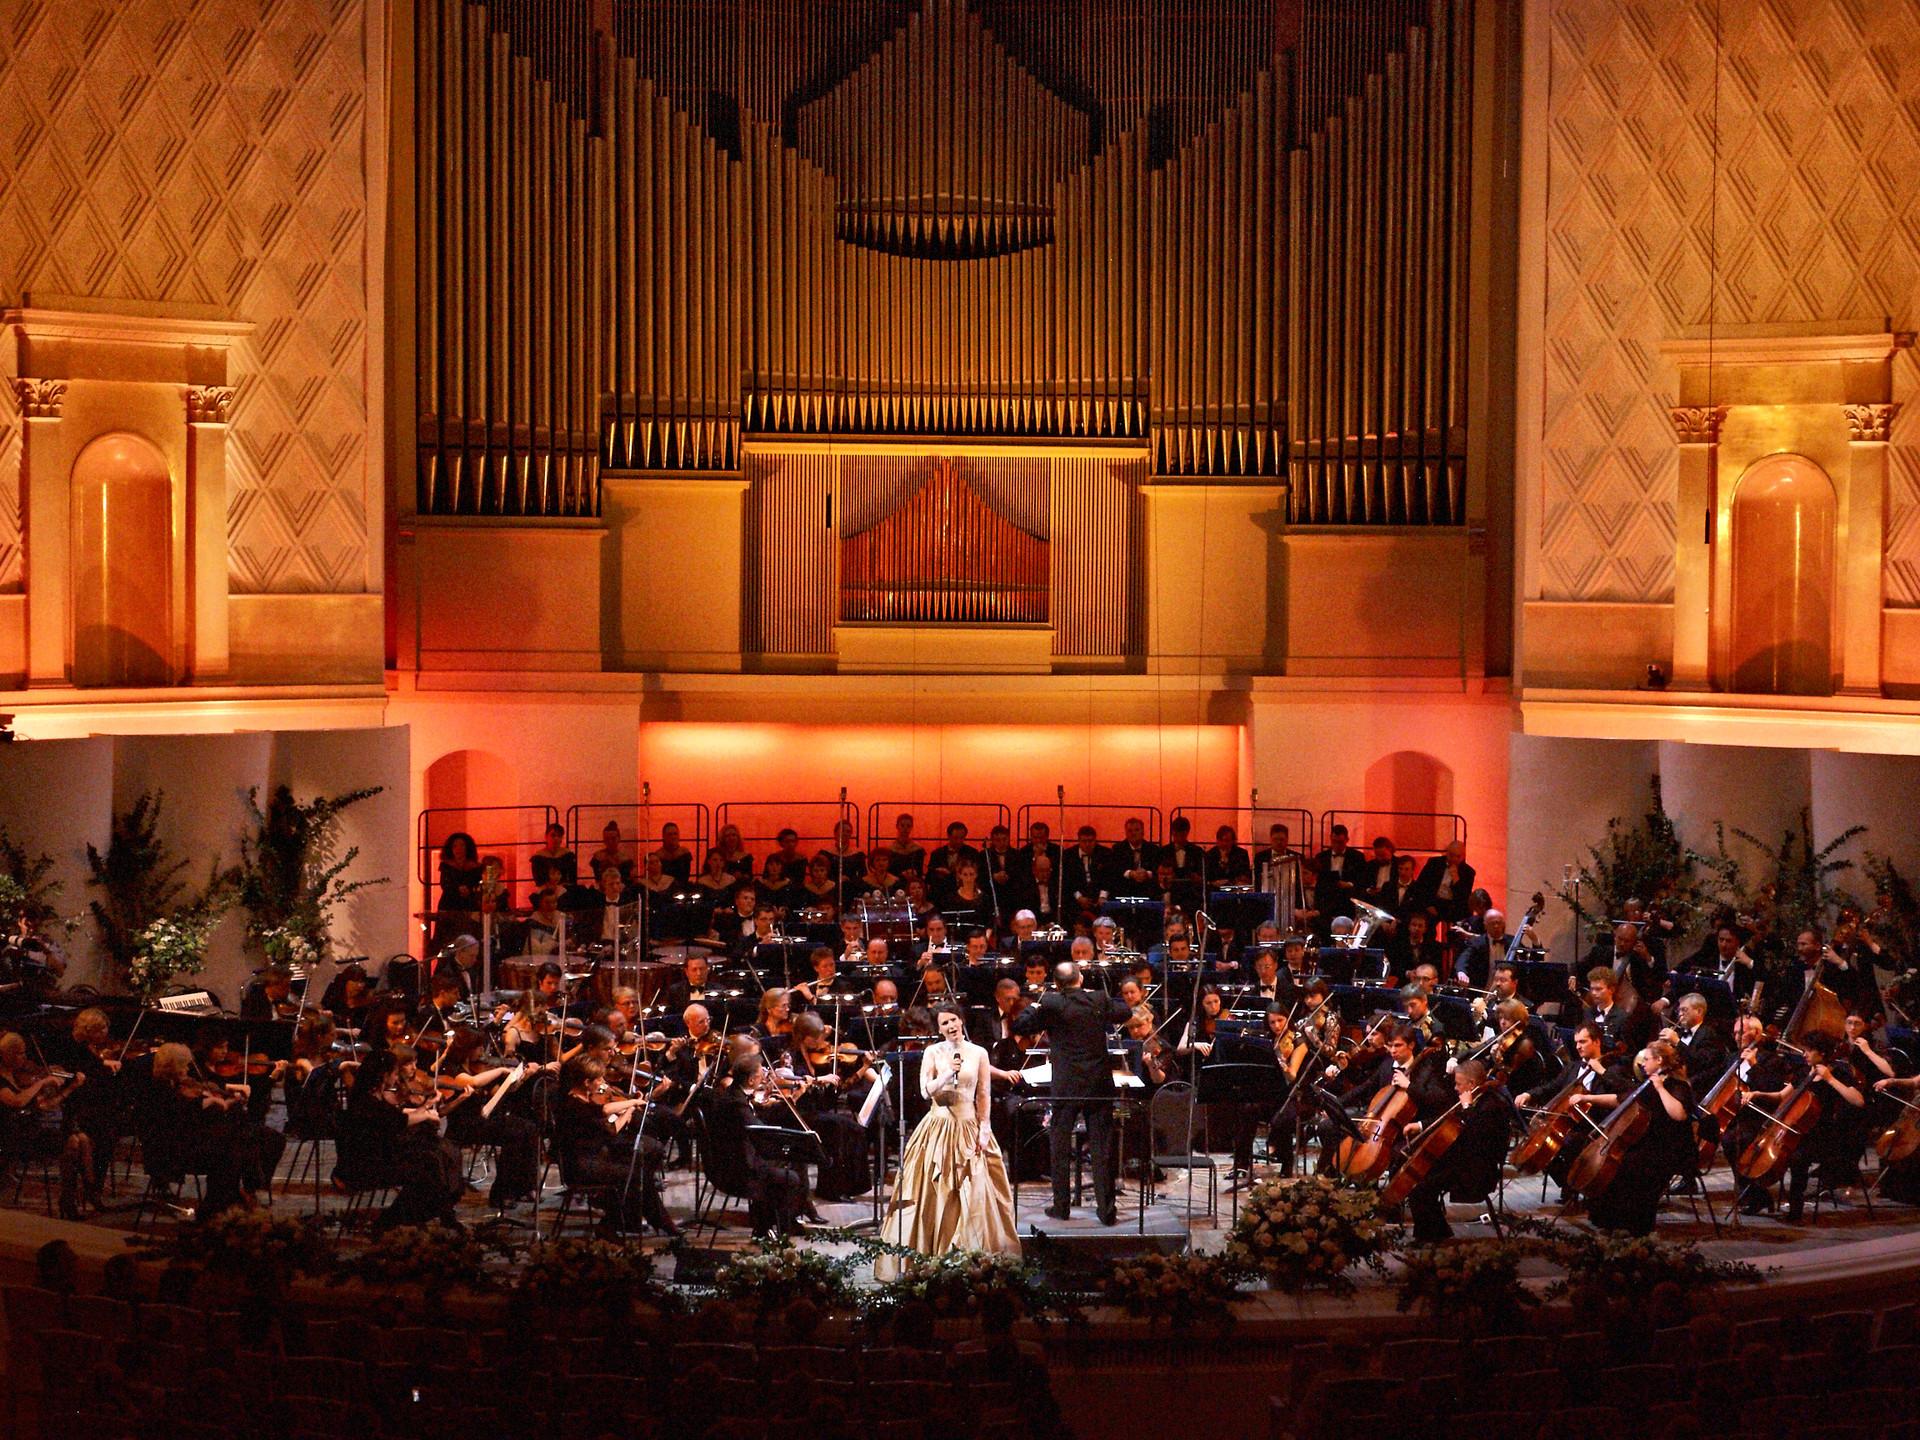 Moskovska filharmonija, koncert Mance Izmajlove s filmskim orkestrom